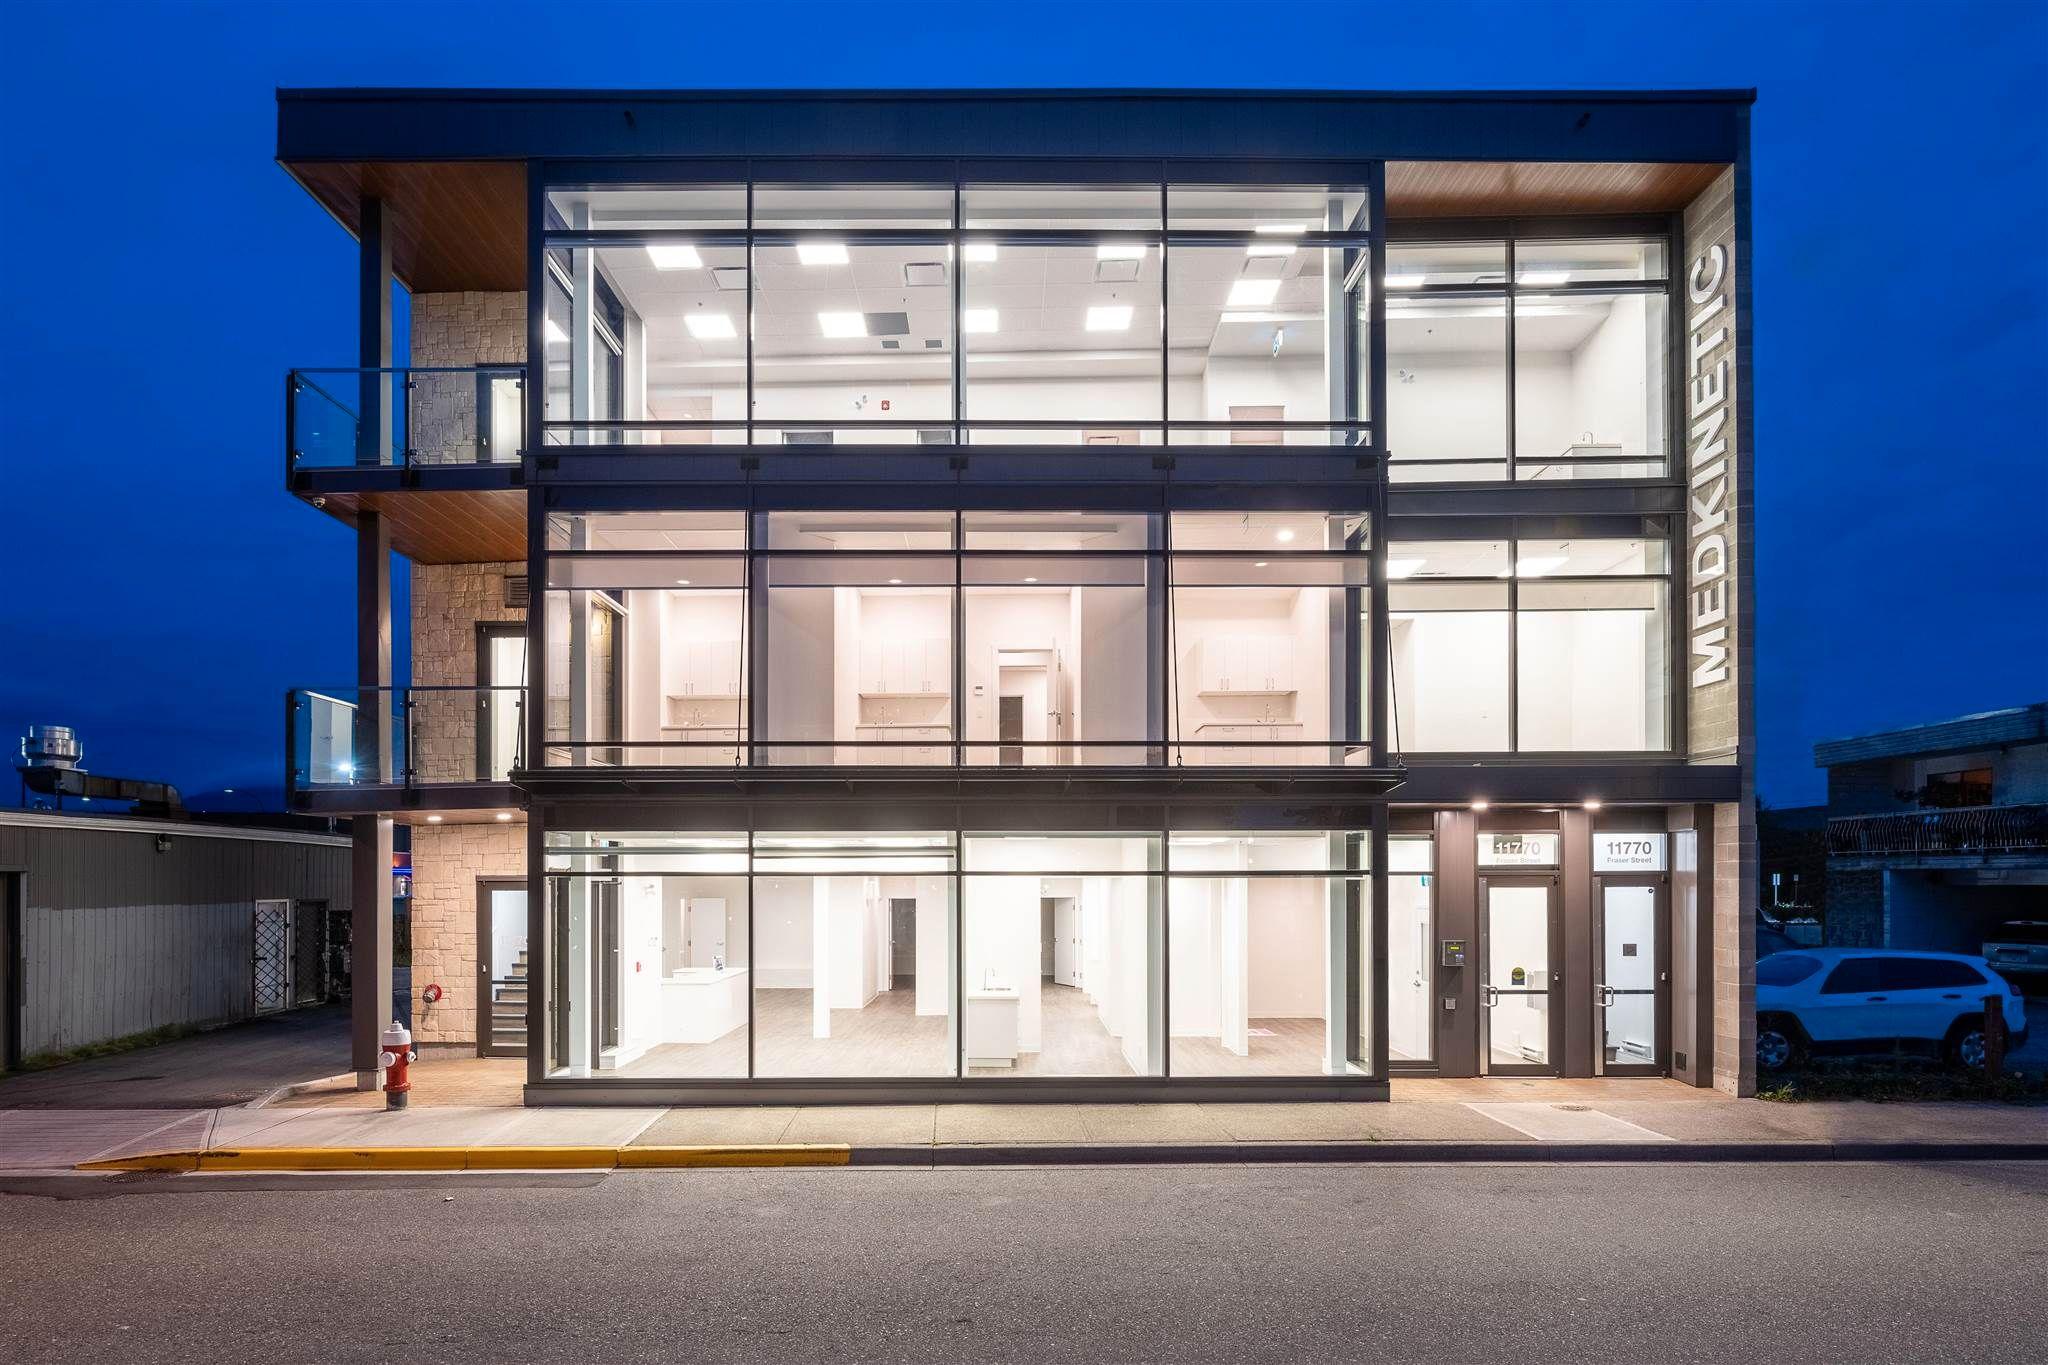 Main Photo: 200 11770 FRASER STREET in Maple Ridge: East Central Office for lease : MLS®# C8039578